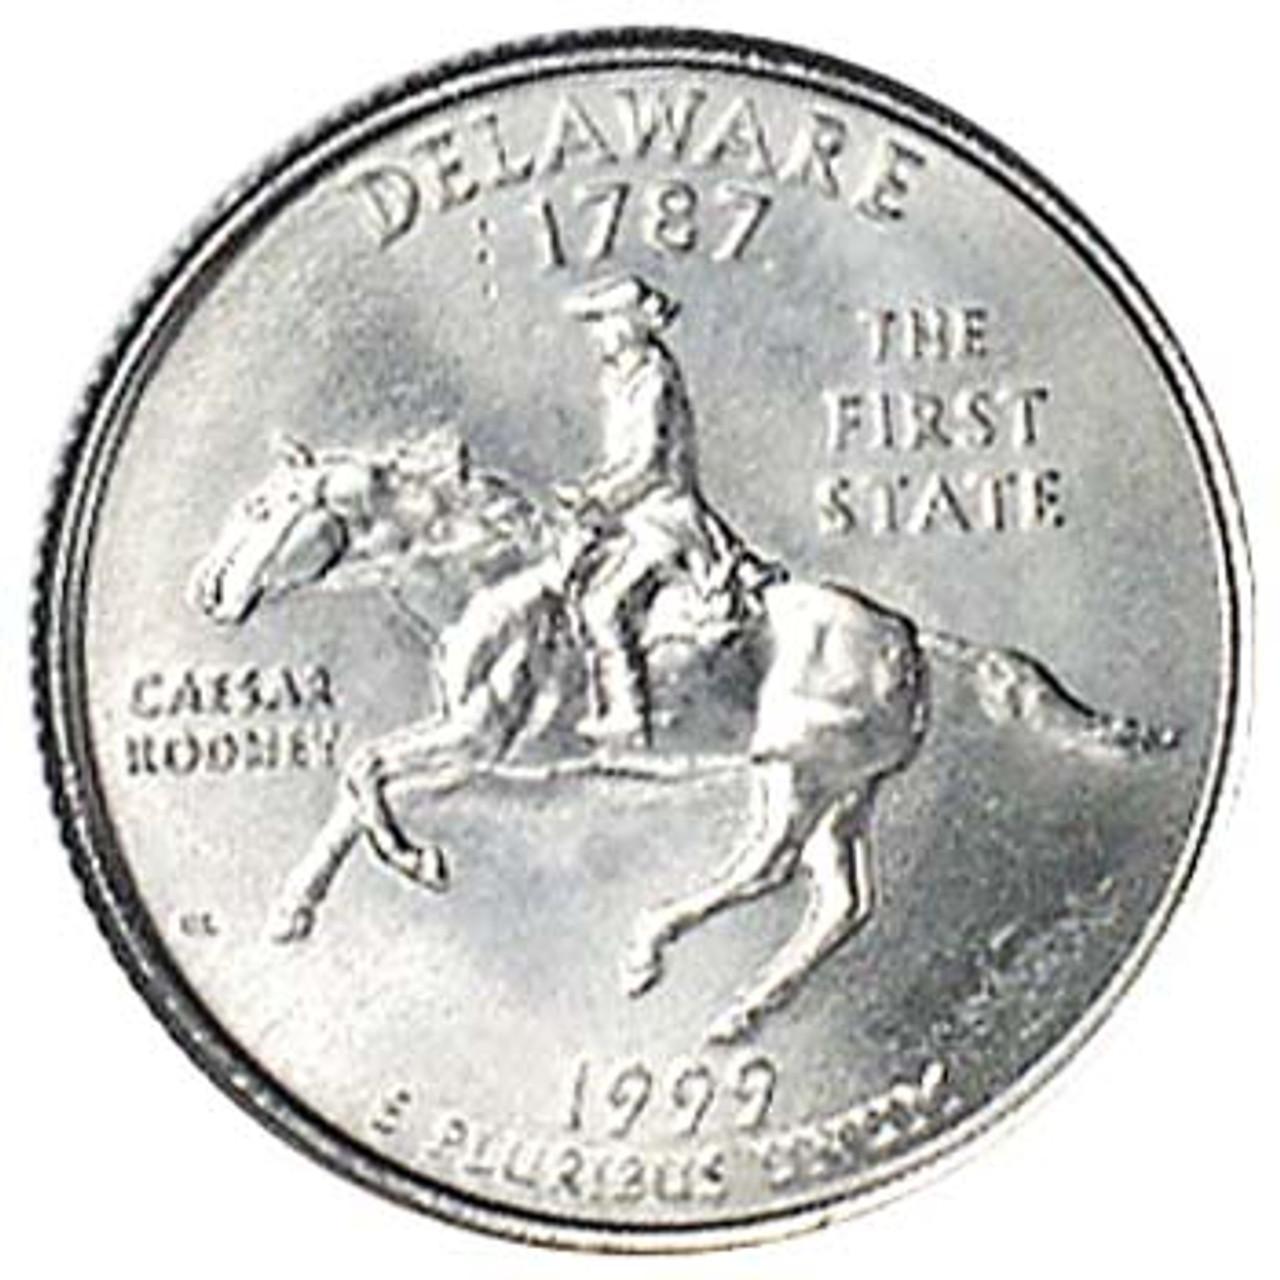 1999-P Delaware Quarter Brilliant Uncirculated Image 1